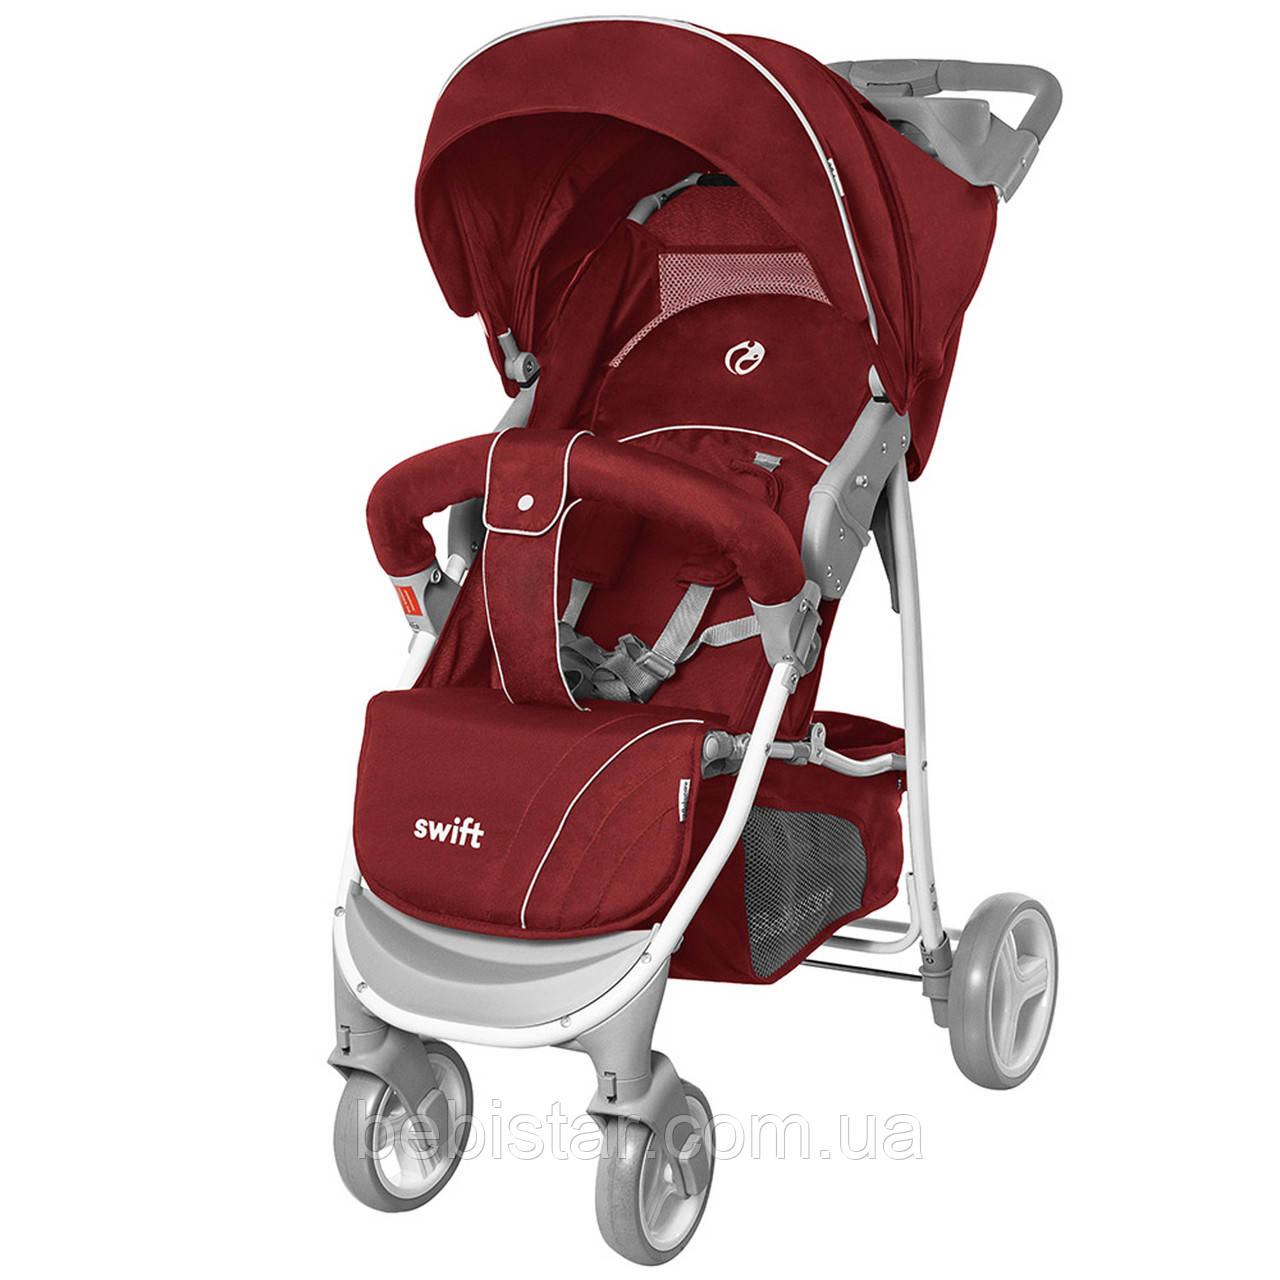 Детская прогулочная коляска красная с дождевиком BABYCARE Swift BC-11201/1 Red